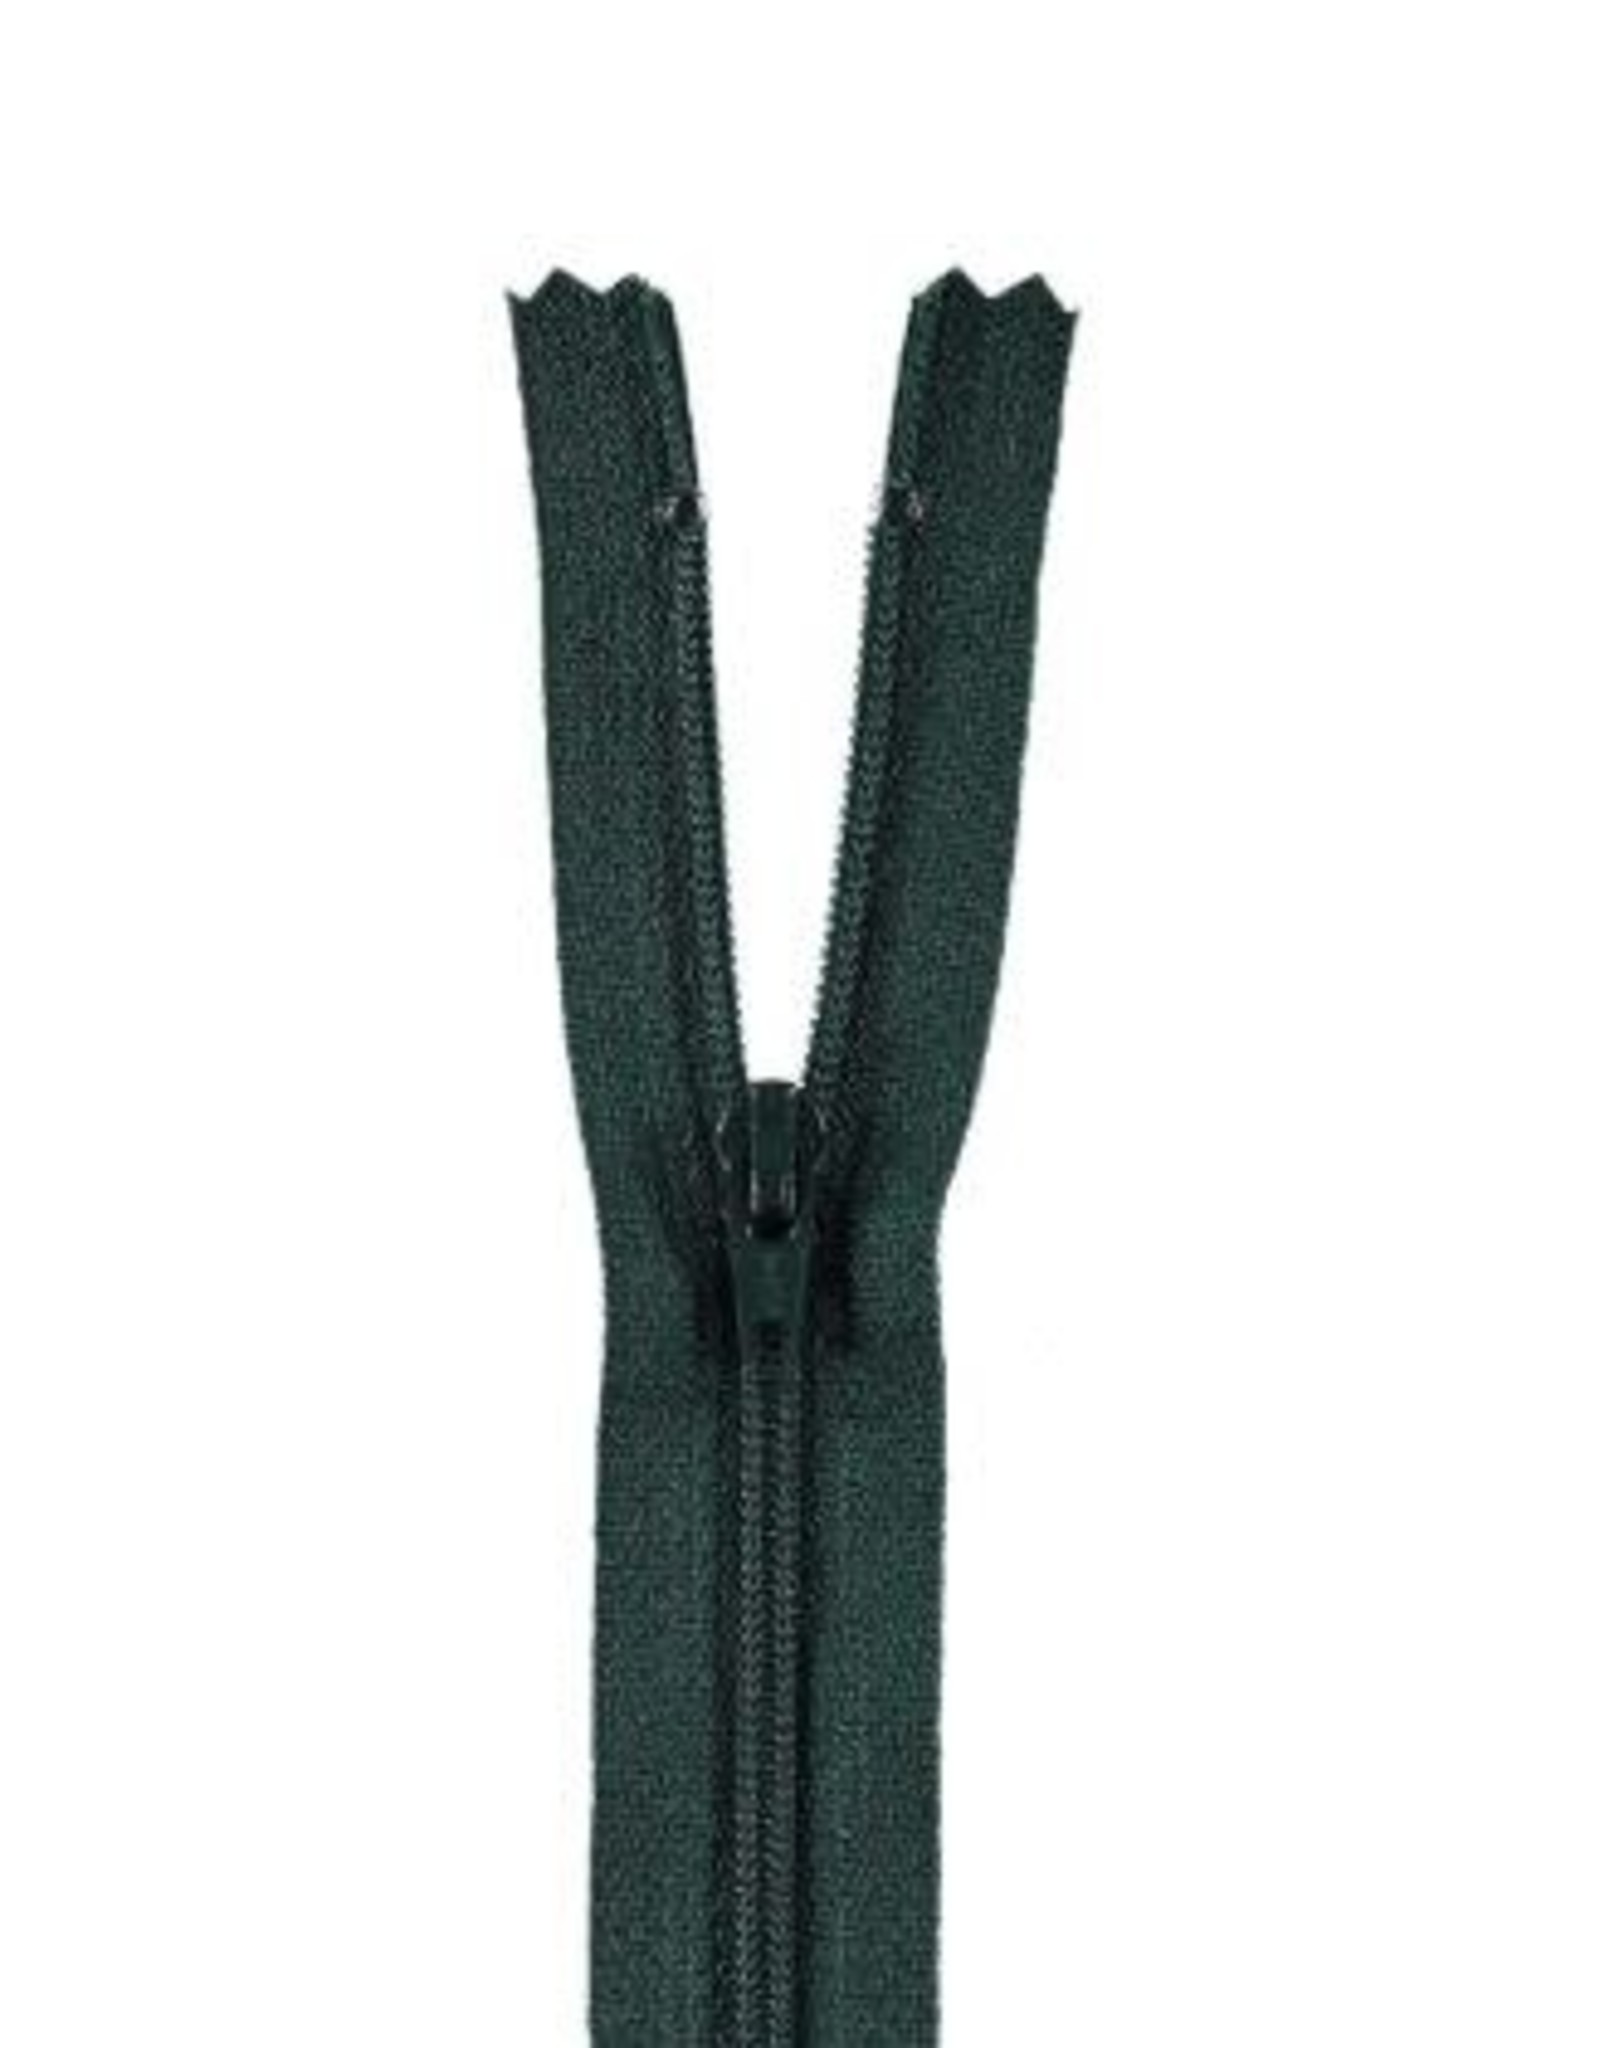 YKK Spiraalrits niet-DB 3mm donker groen 890-20cm